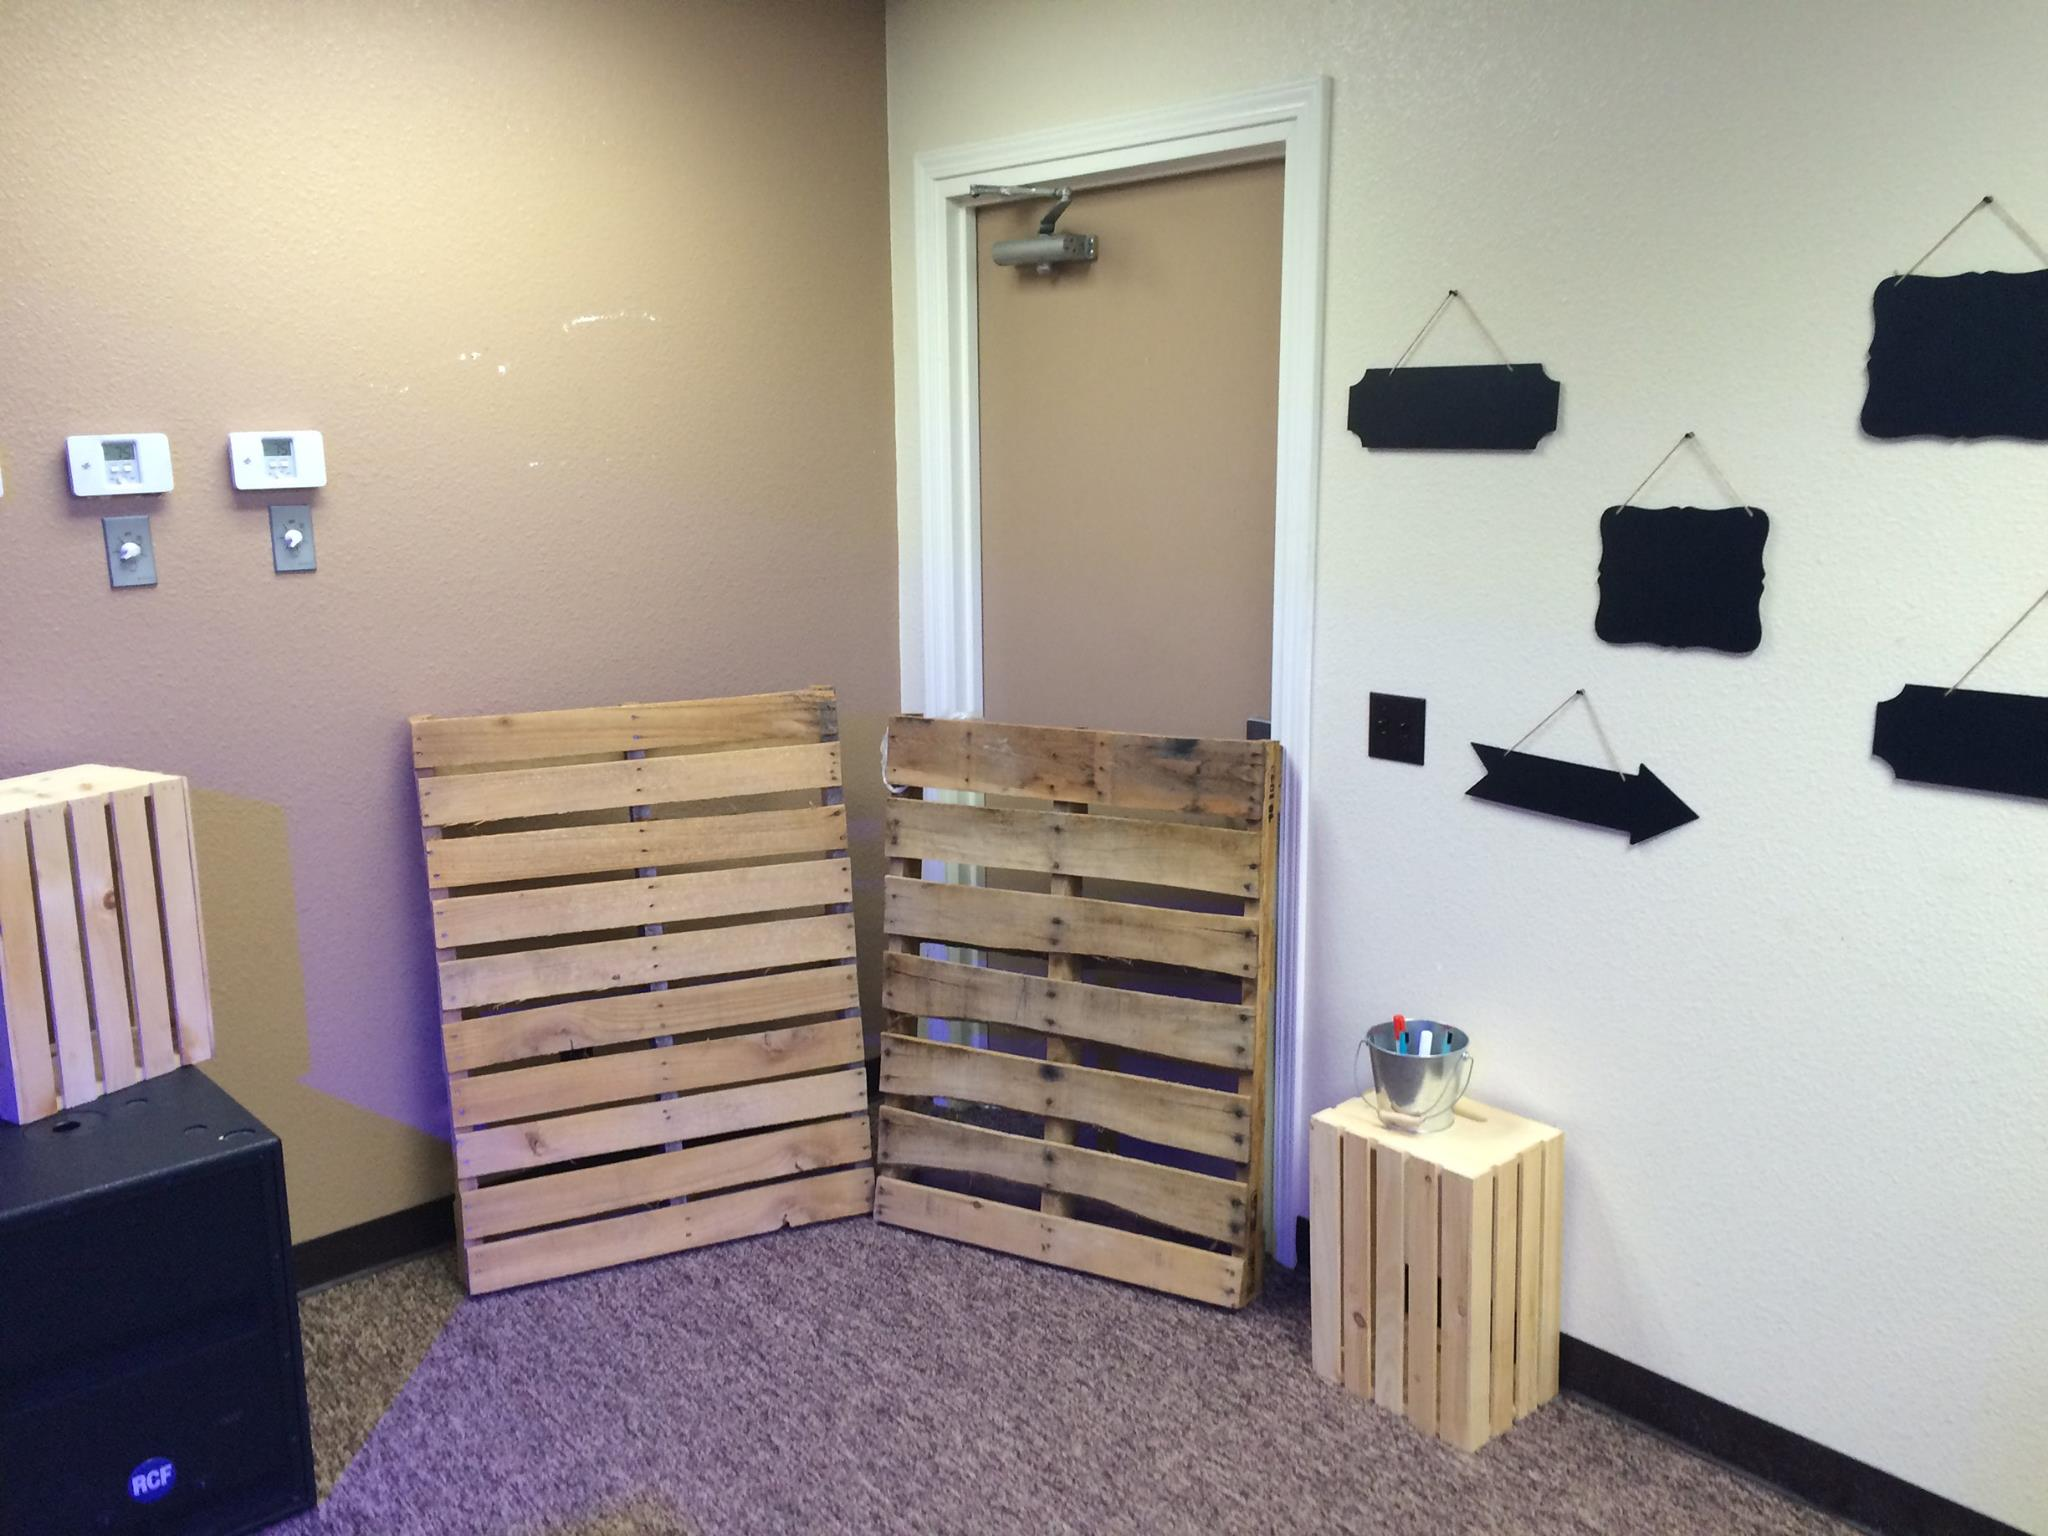 Student Worship Response Station 3